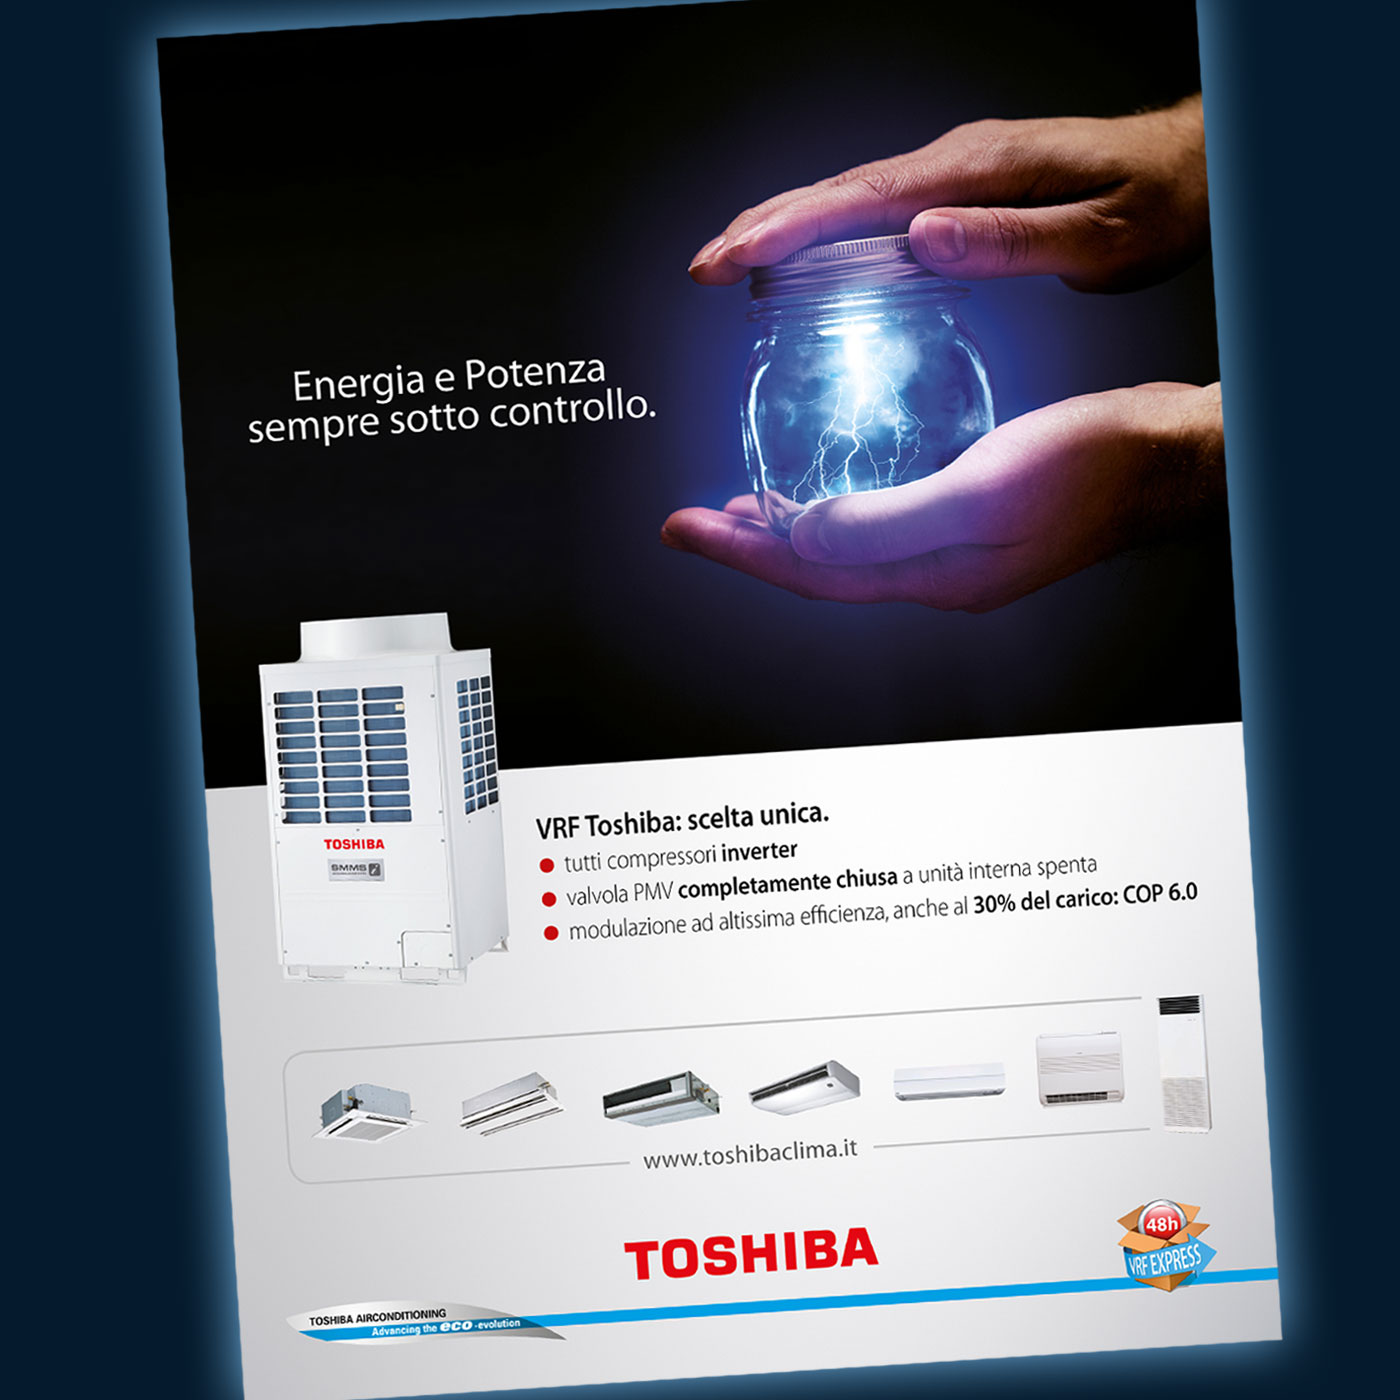 Toshiba VRF